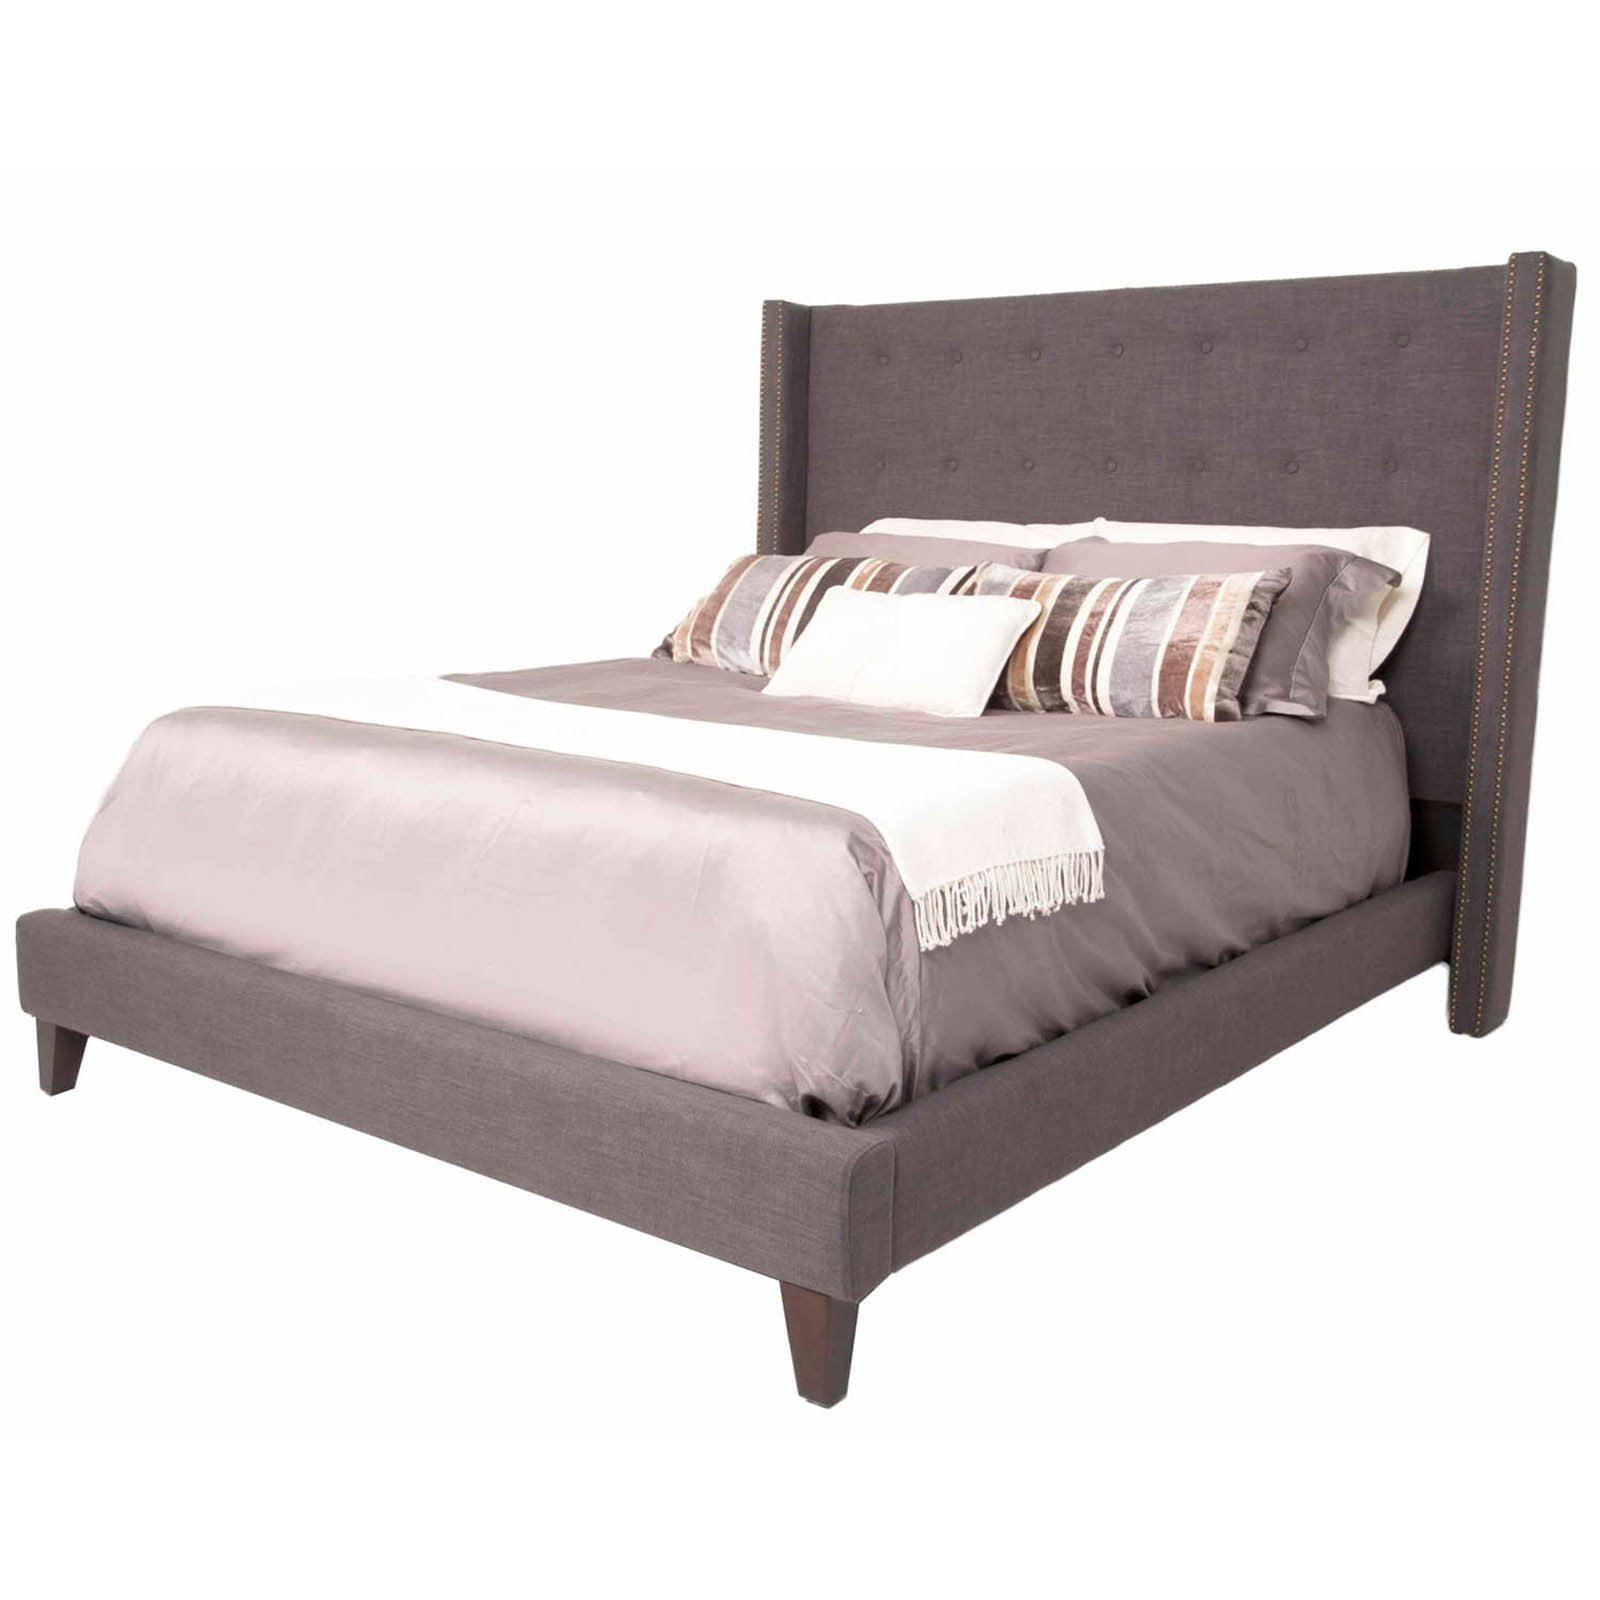 Orient Express Furniture Weston Bed